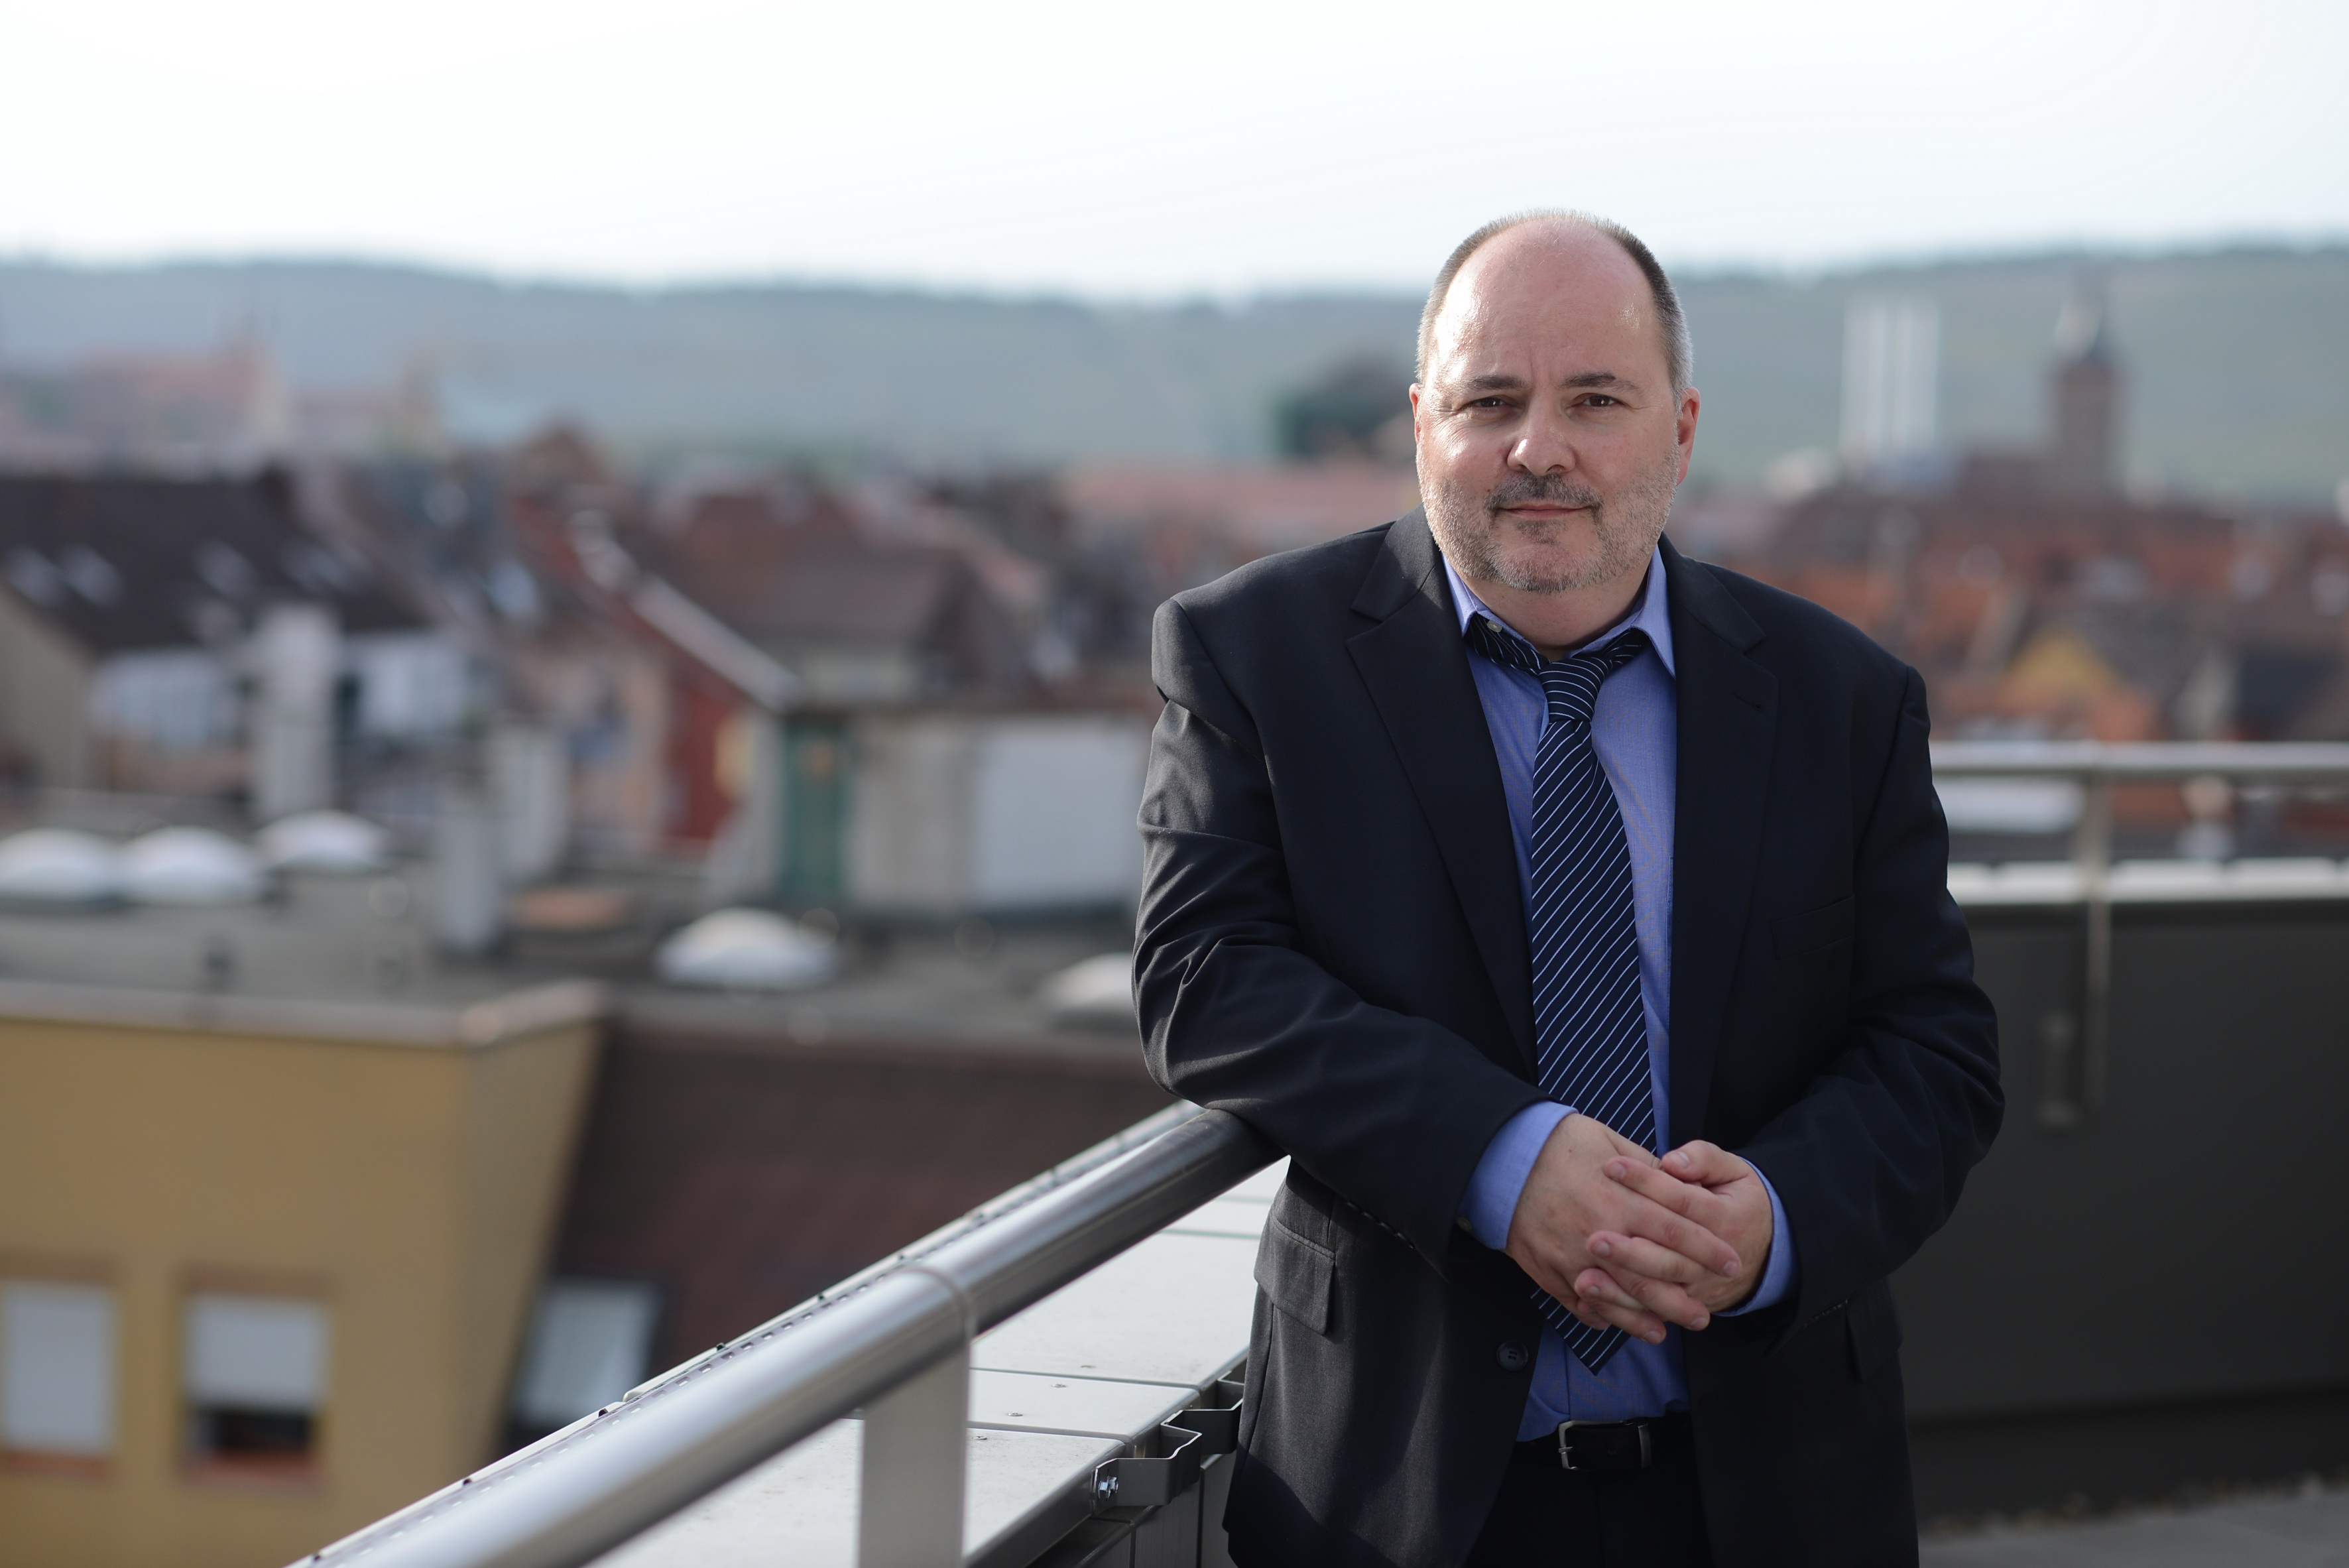 <p>Medienexperte Prof. Dr. Lutz Frühbrodt. Foto: Johannes Untch.</p>